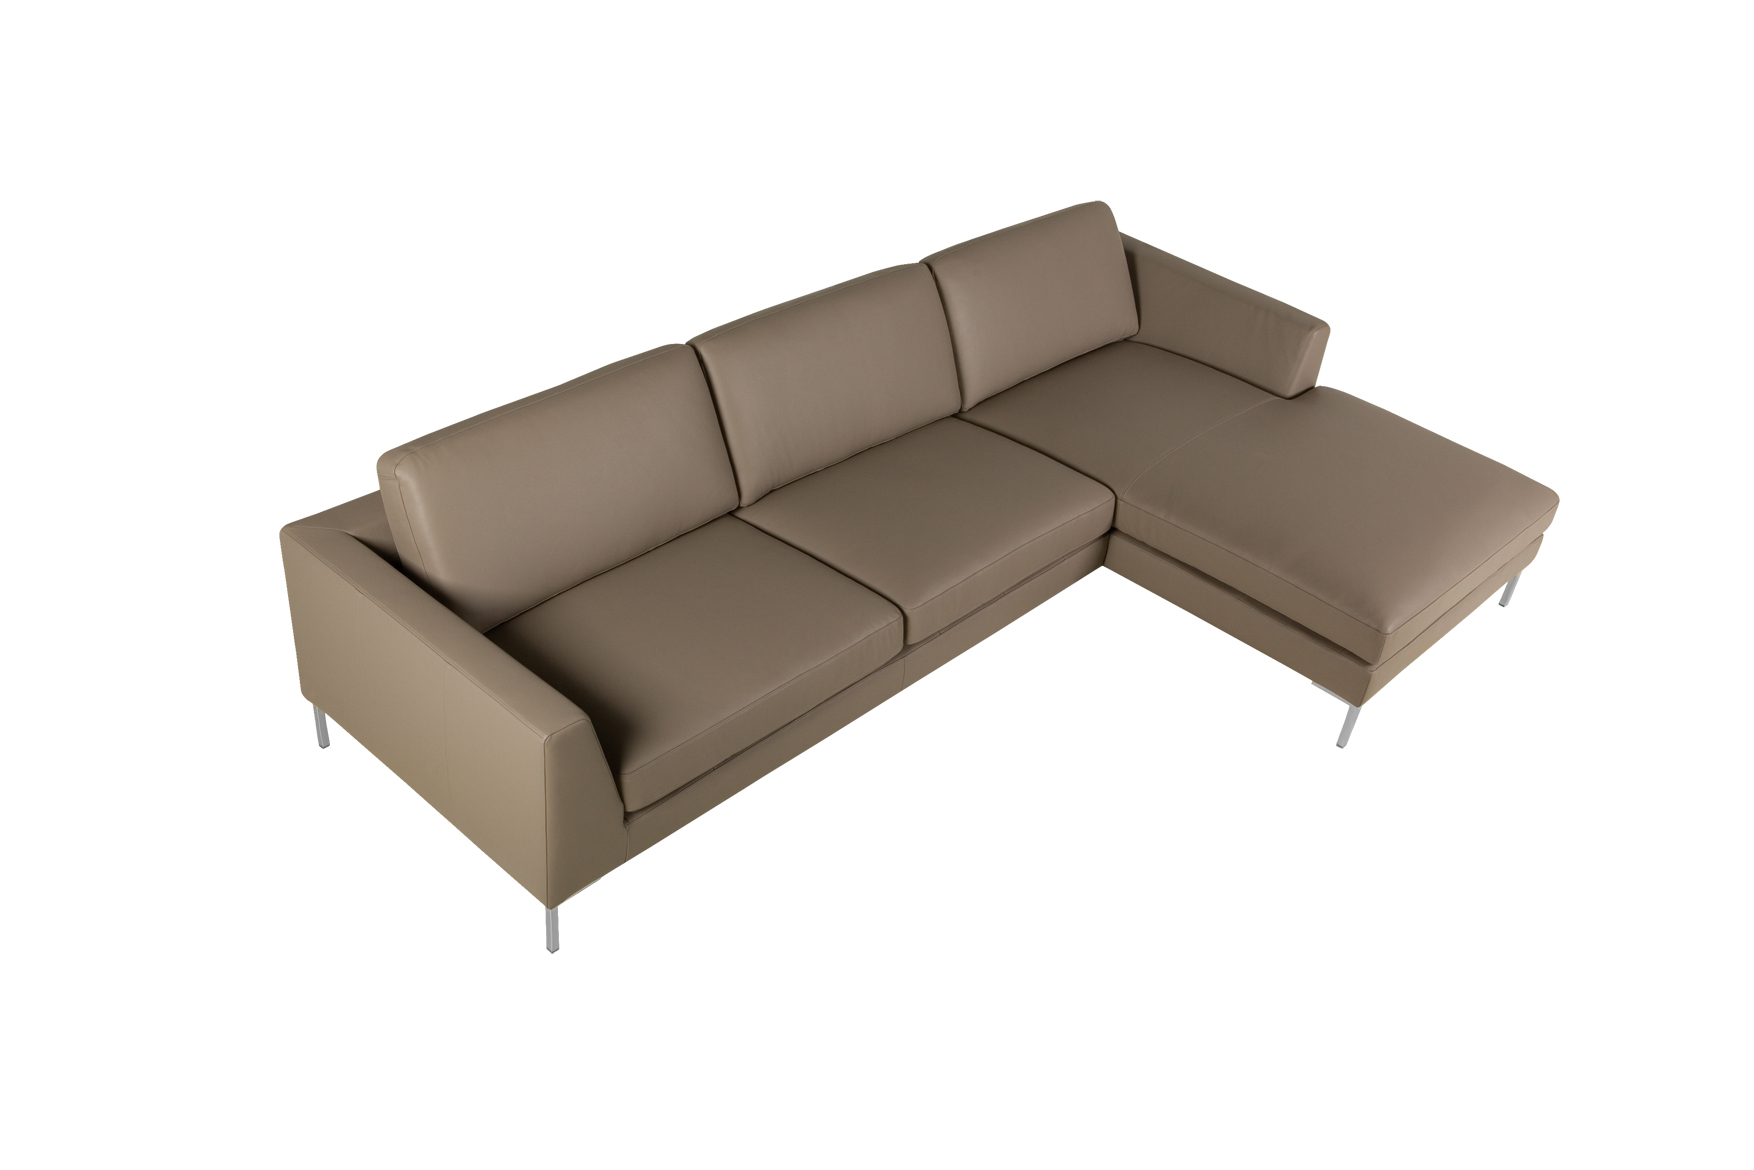 Allegra Set 1 Sofa With Chaiselongue-33210